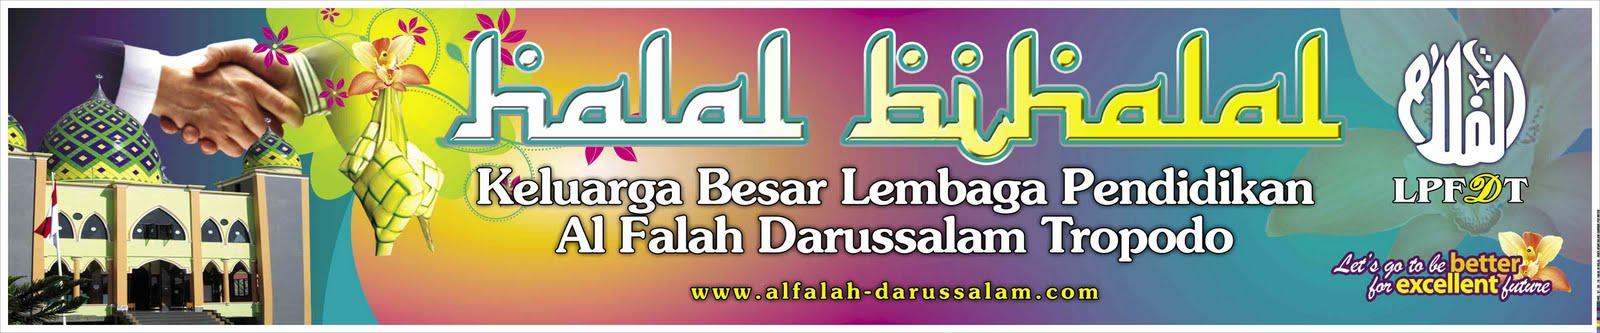 Spanduk Halal Bihalal Keluarga Besar Lembaga Pendidikan Al Falah Image